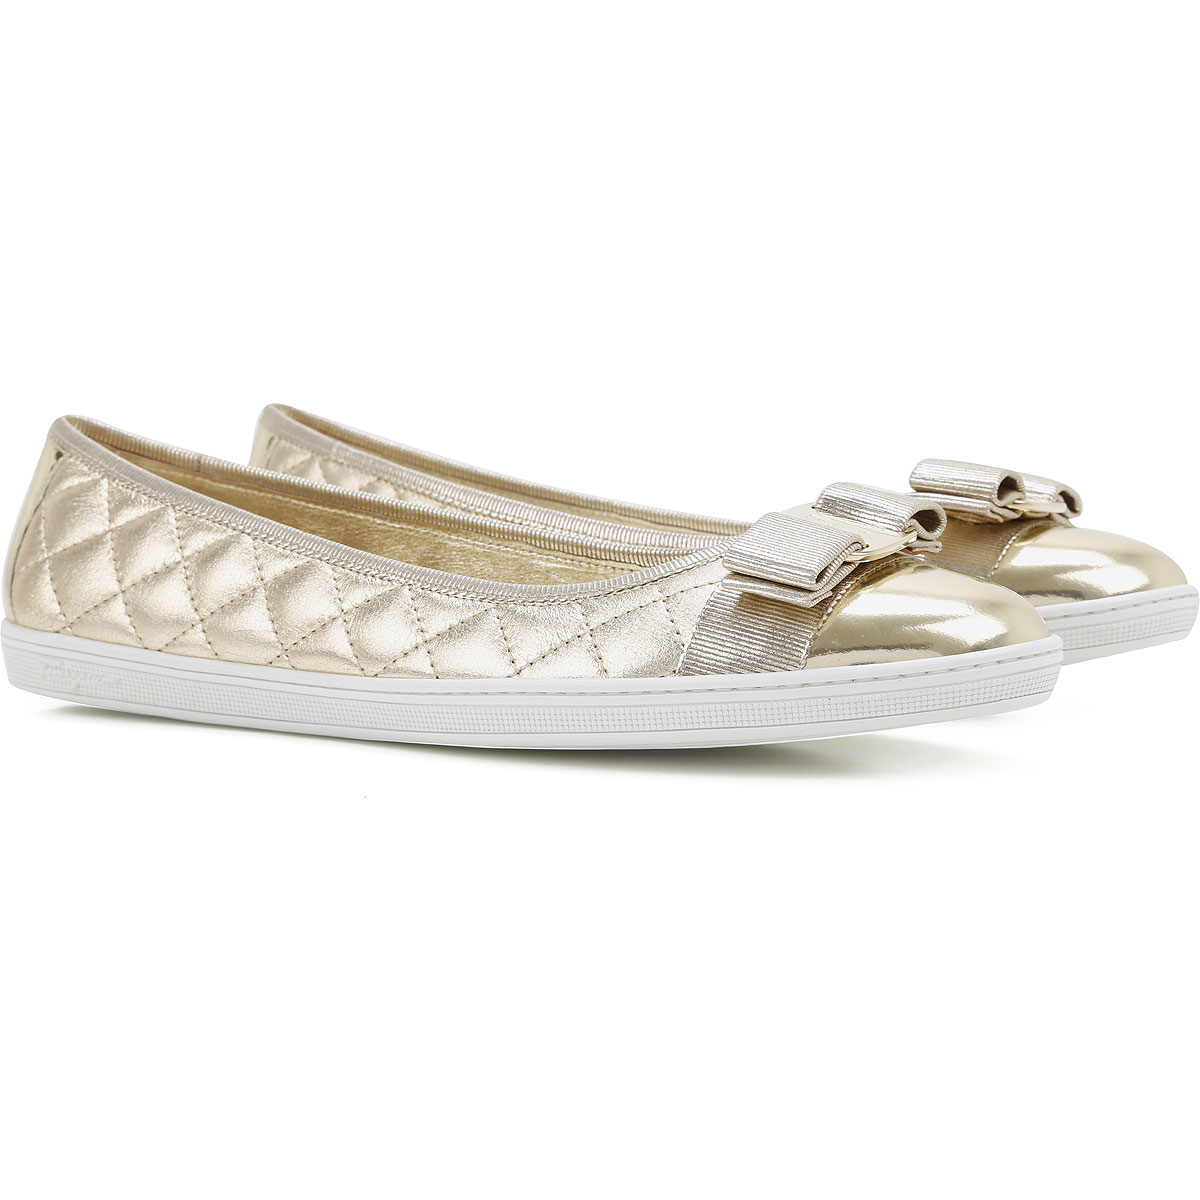 Womens Shoes Salvatore Ferragamo Style code 618366rufinaoro 351447